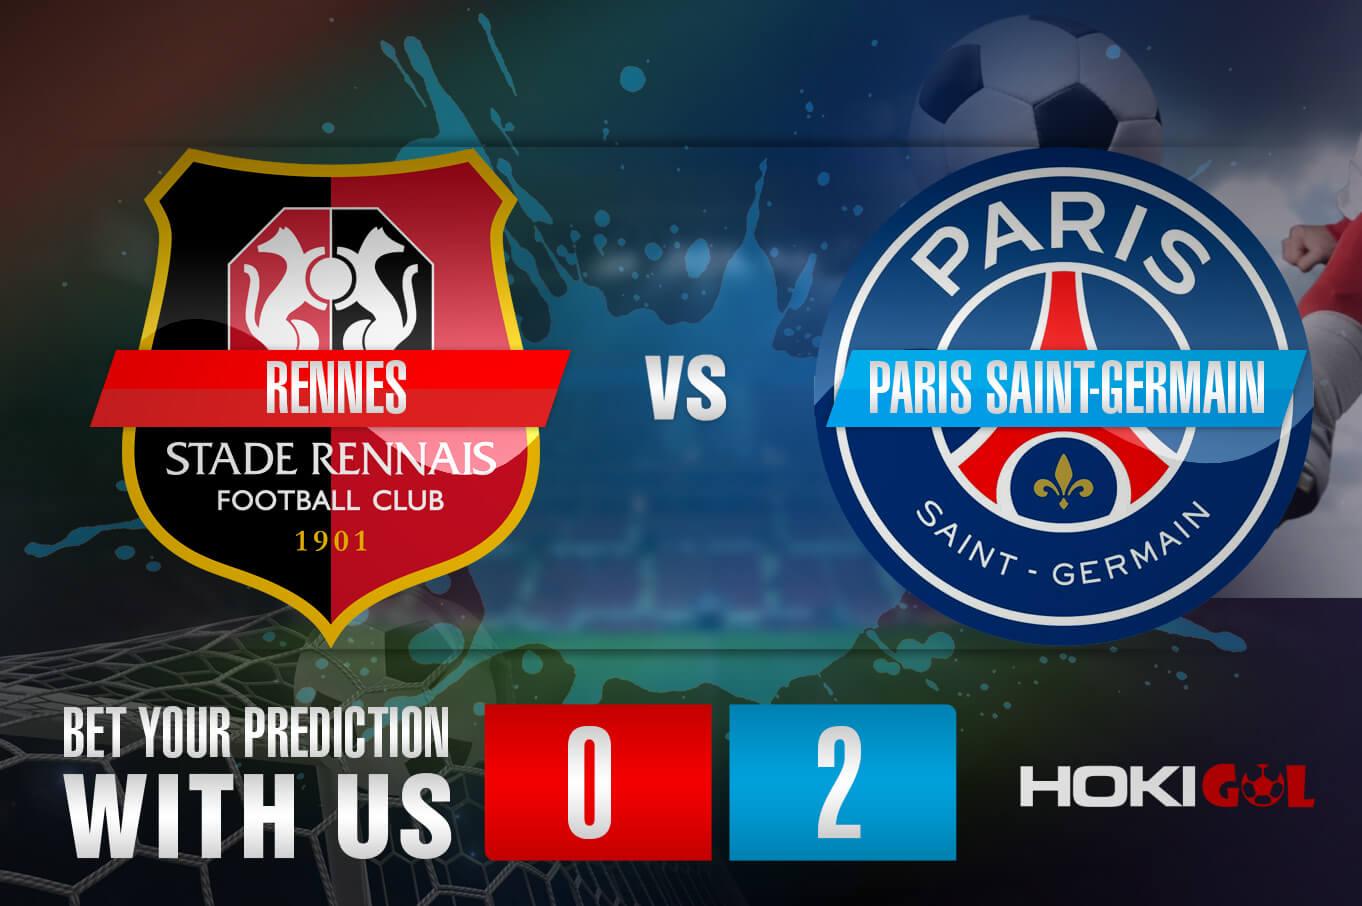 Prediksi Bola Rennes Vs Paris Saint-Germain 3 Oktober 2021